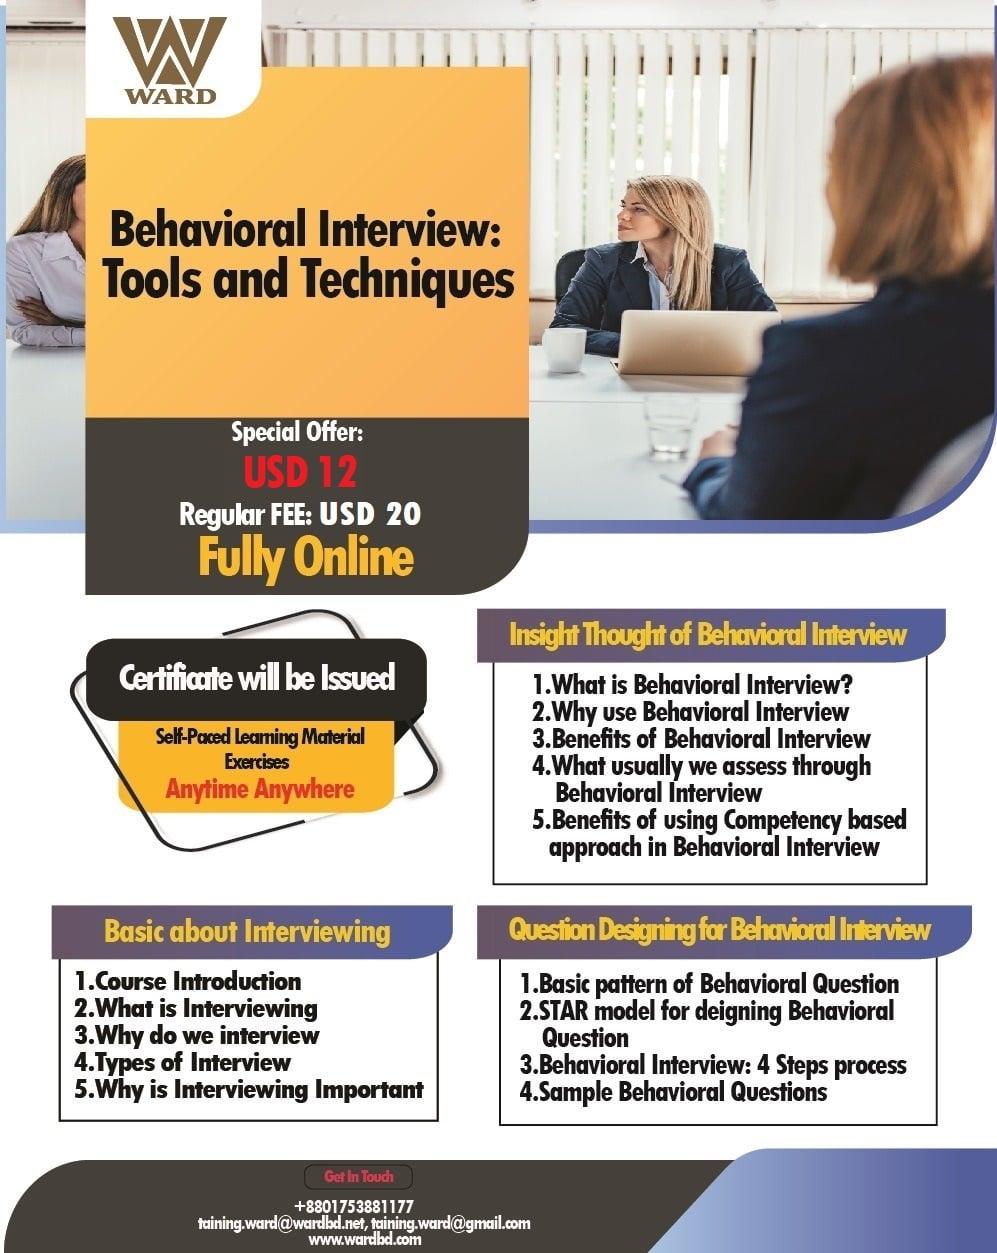 Behavioral Interview: Tools & Techniques